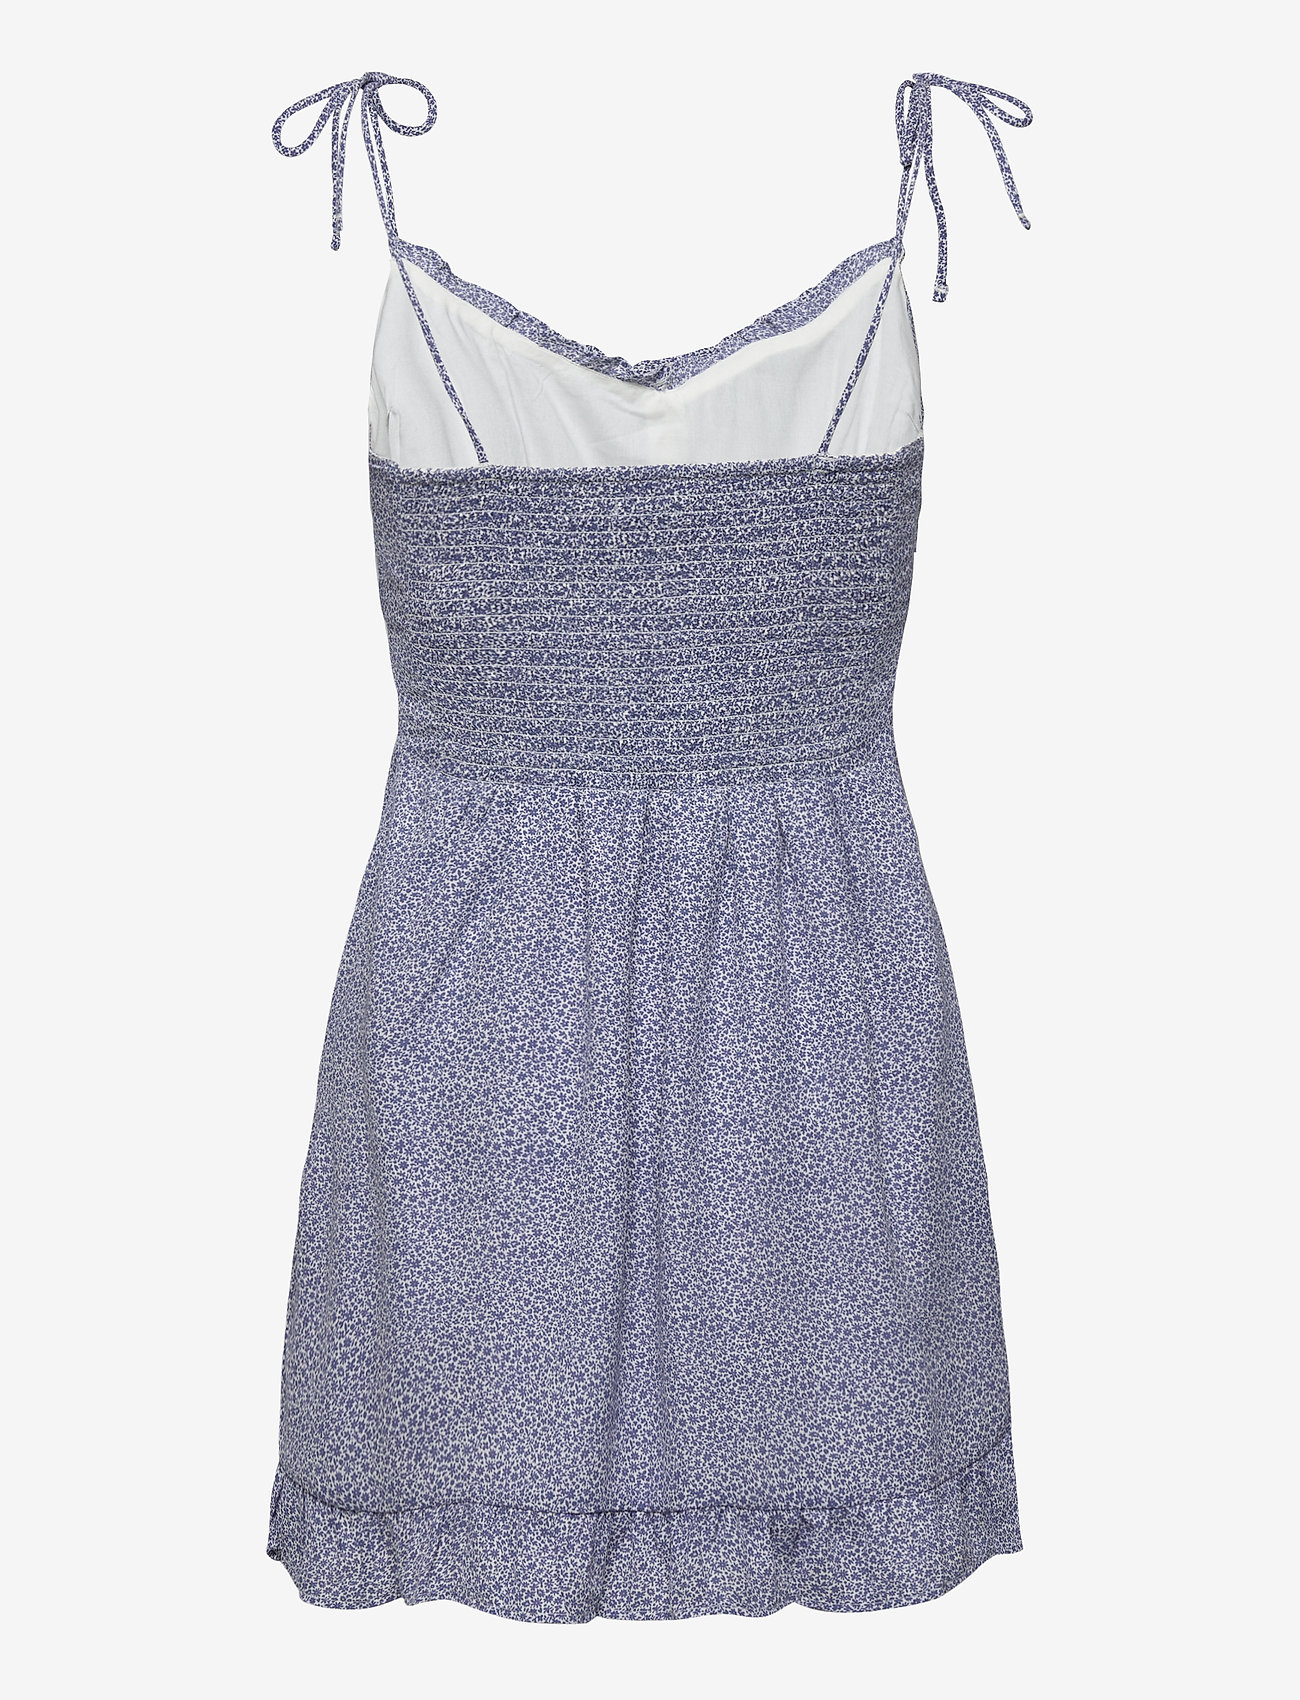 Abercrombie & Fitch - ANF WOMENS DRESSES - sommerkjoler - blue floral - 1